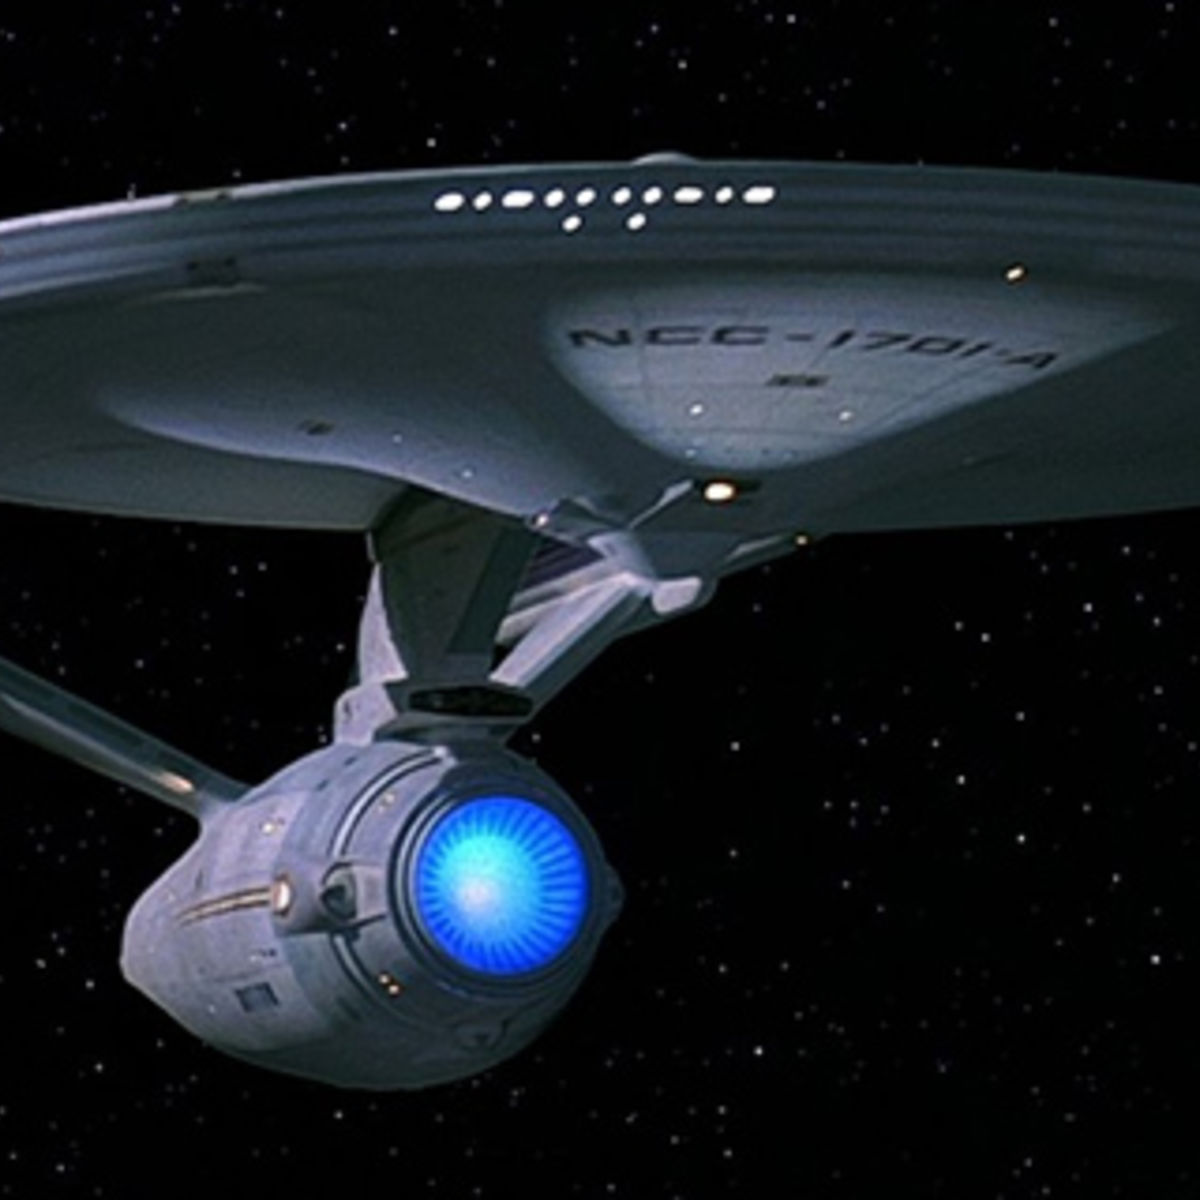 Star Trek USS Enterprise NCC-1701a